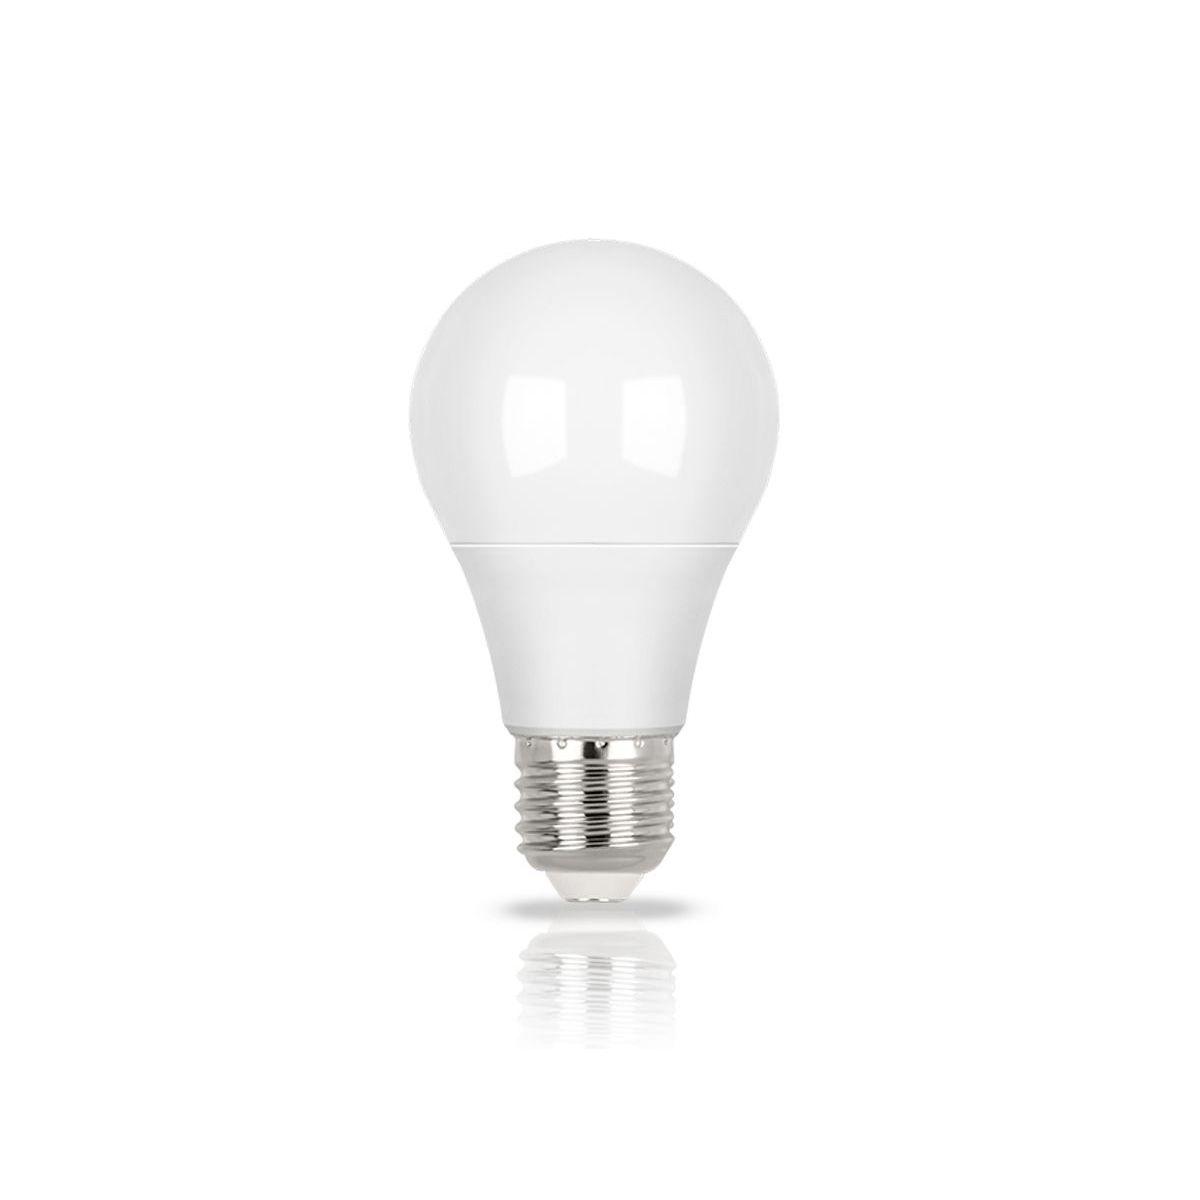 Lâmpada LED Bulbo A60 7W 3000K Branco Quente Bivolt - STELLA -STH8234/30